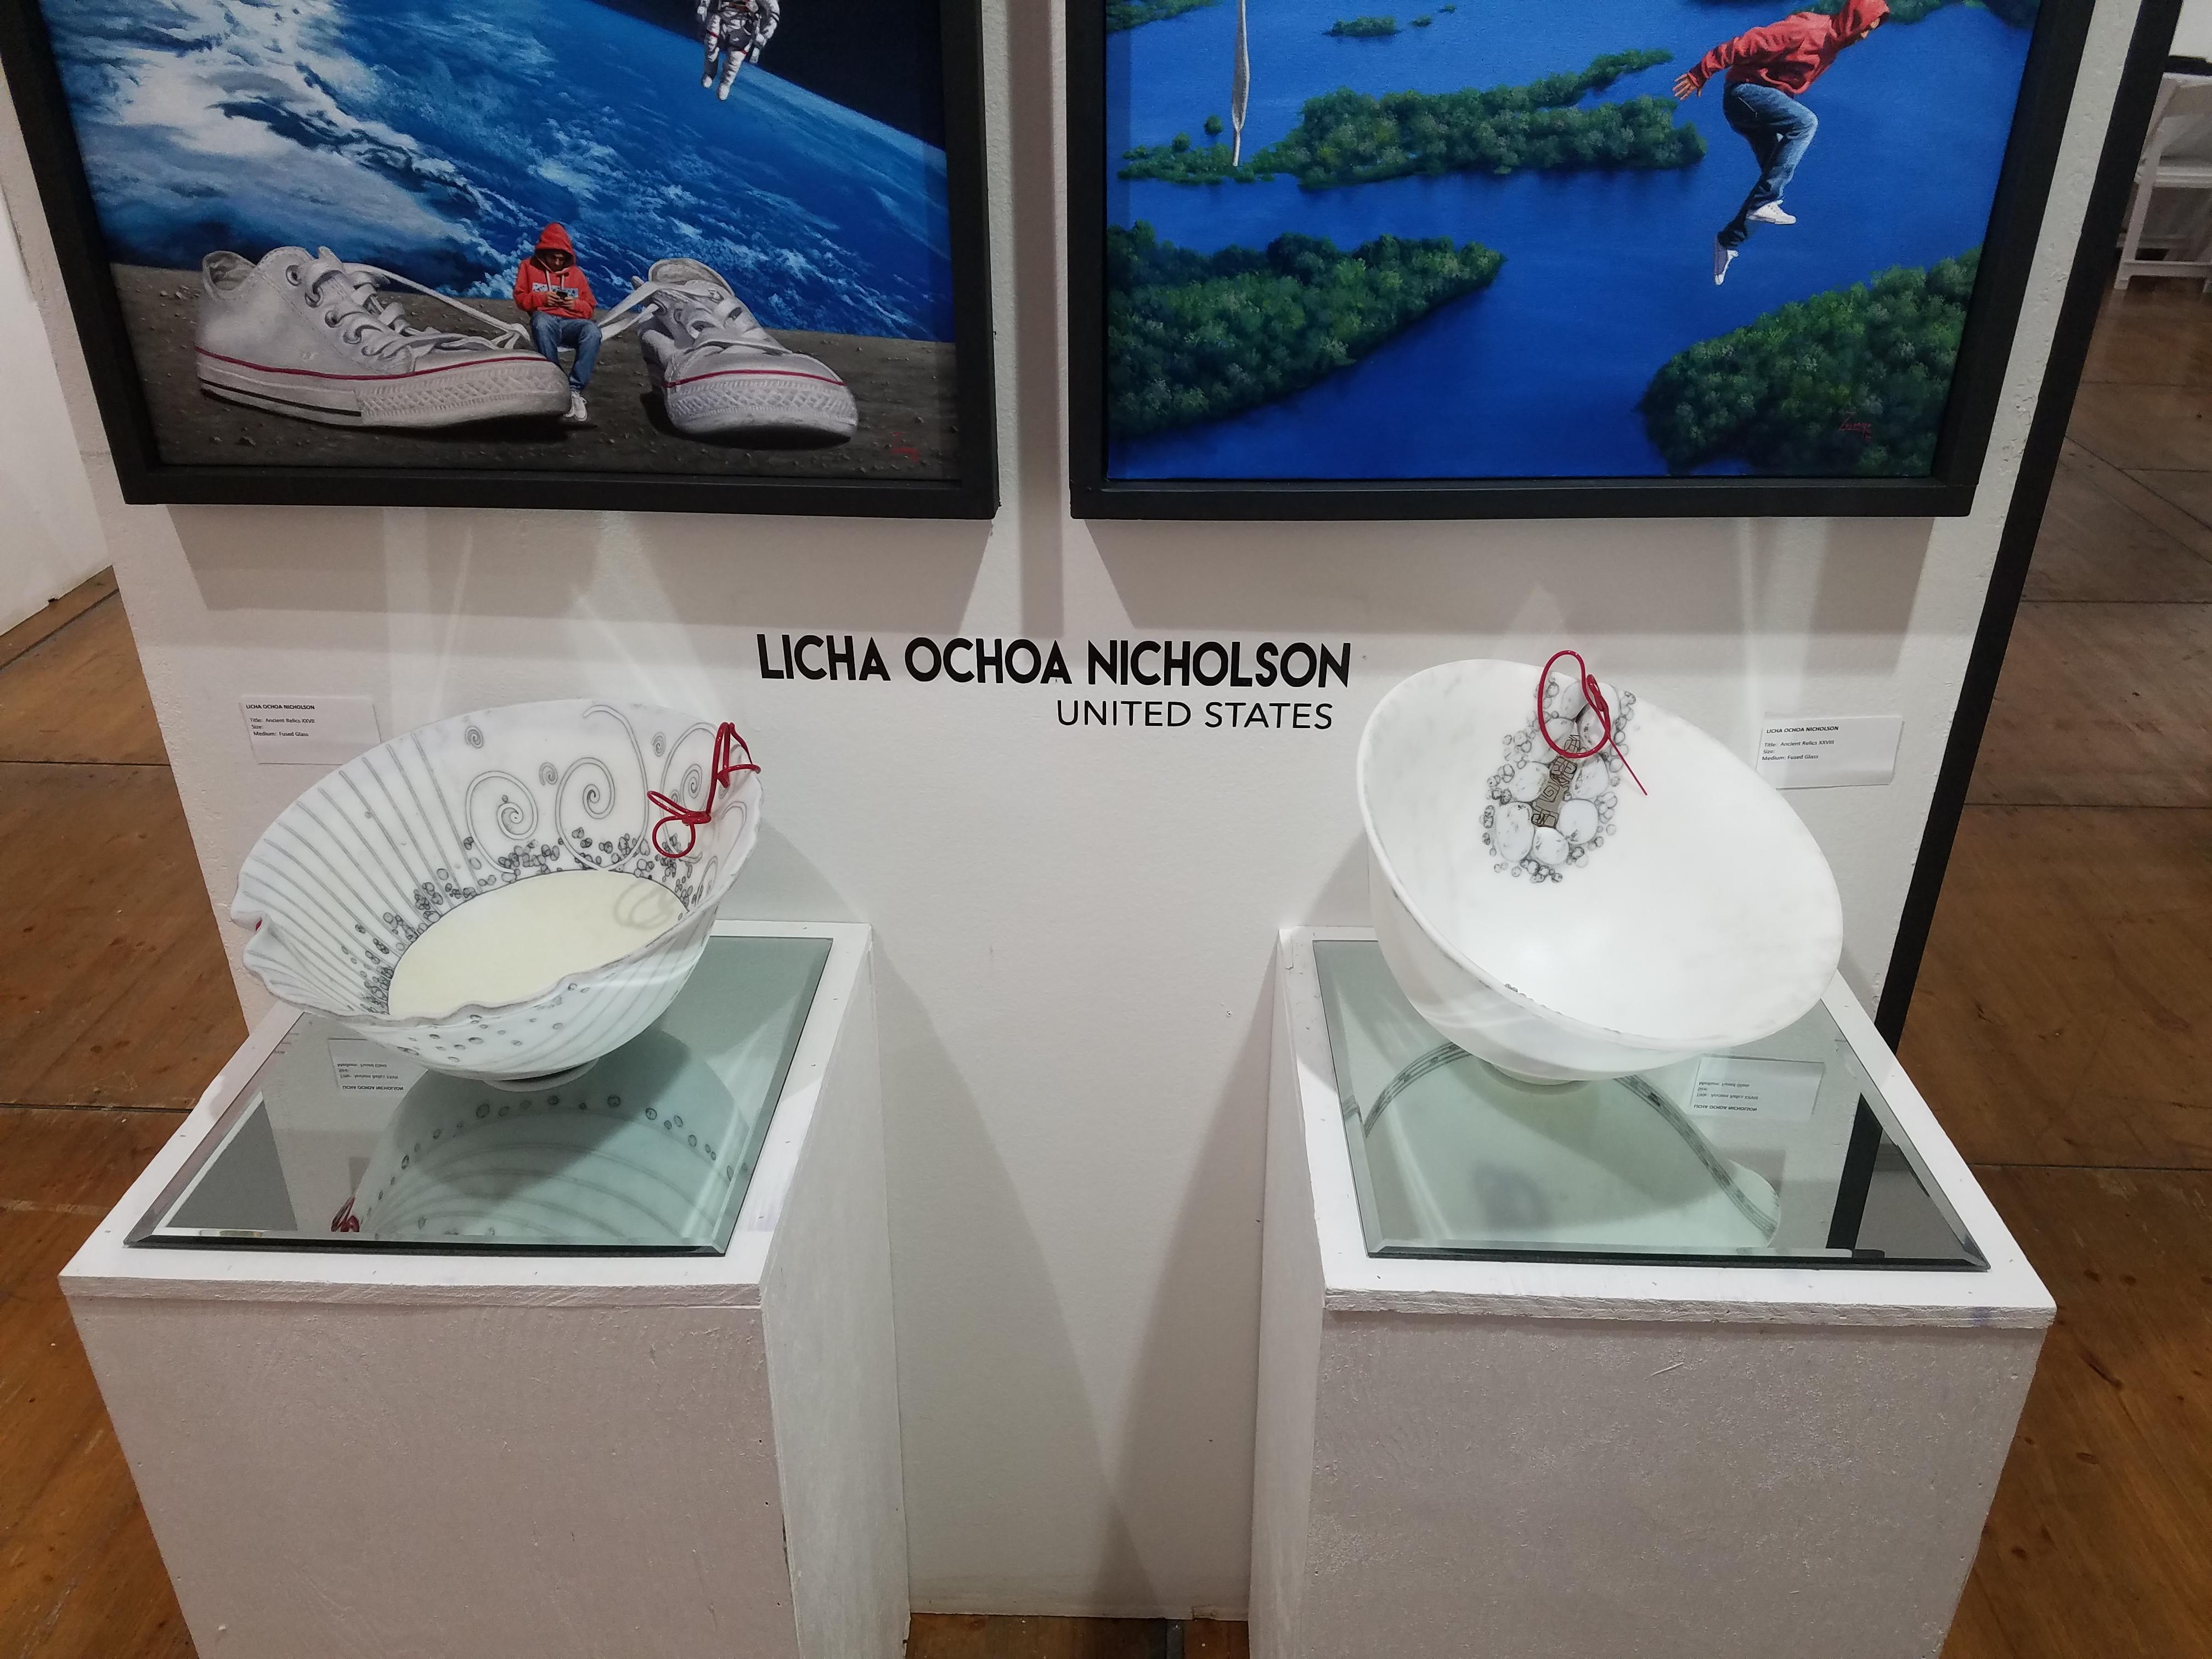 Licha Ochoa Nicholson's Glass pieces